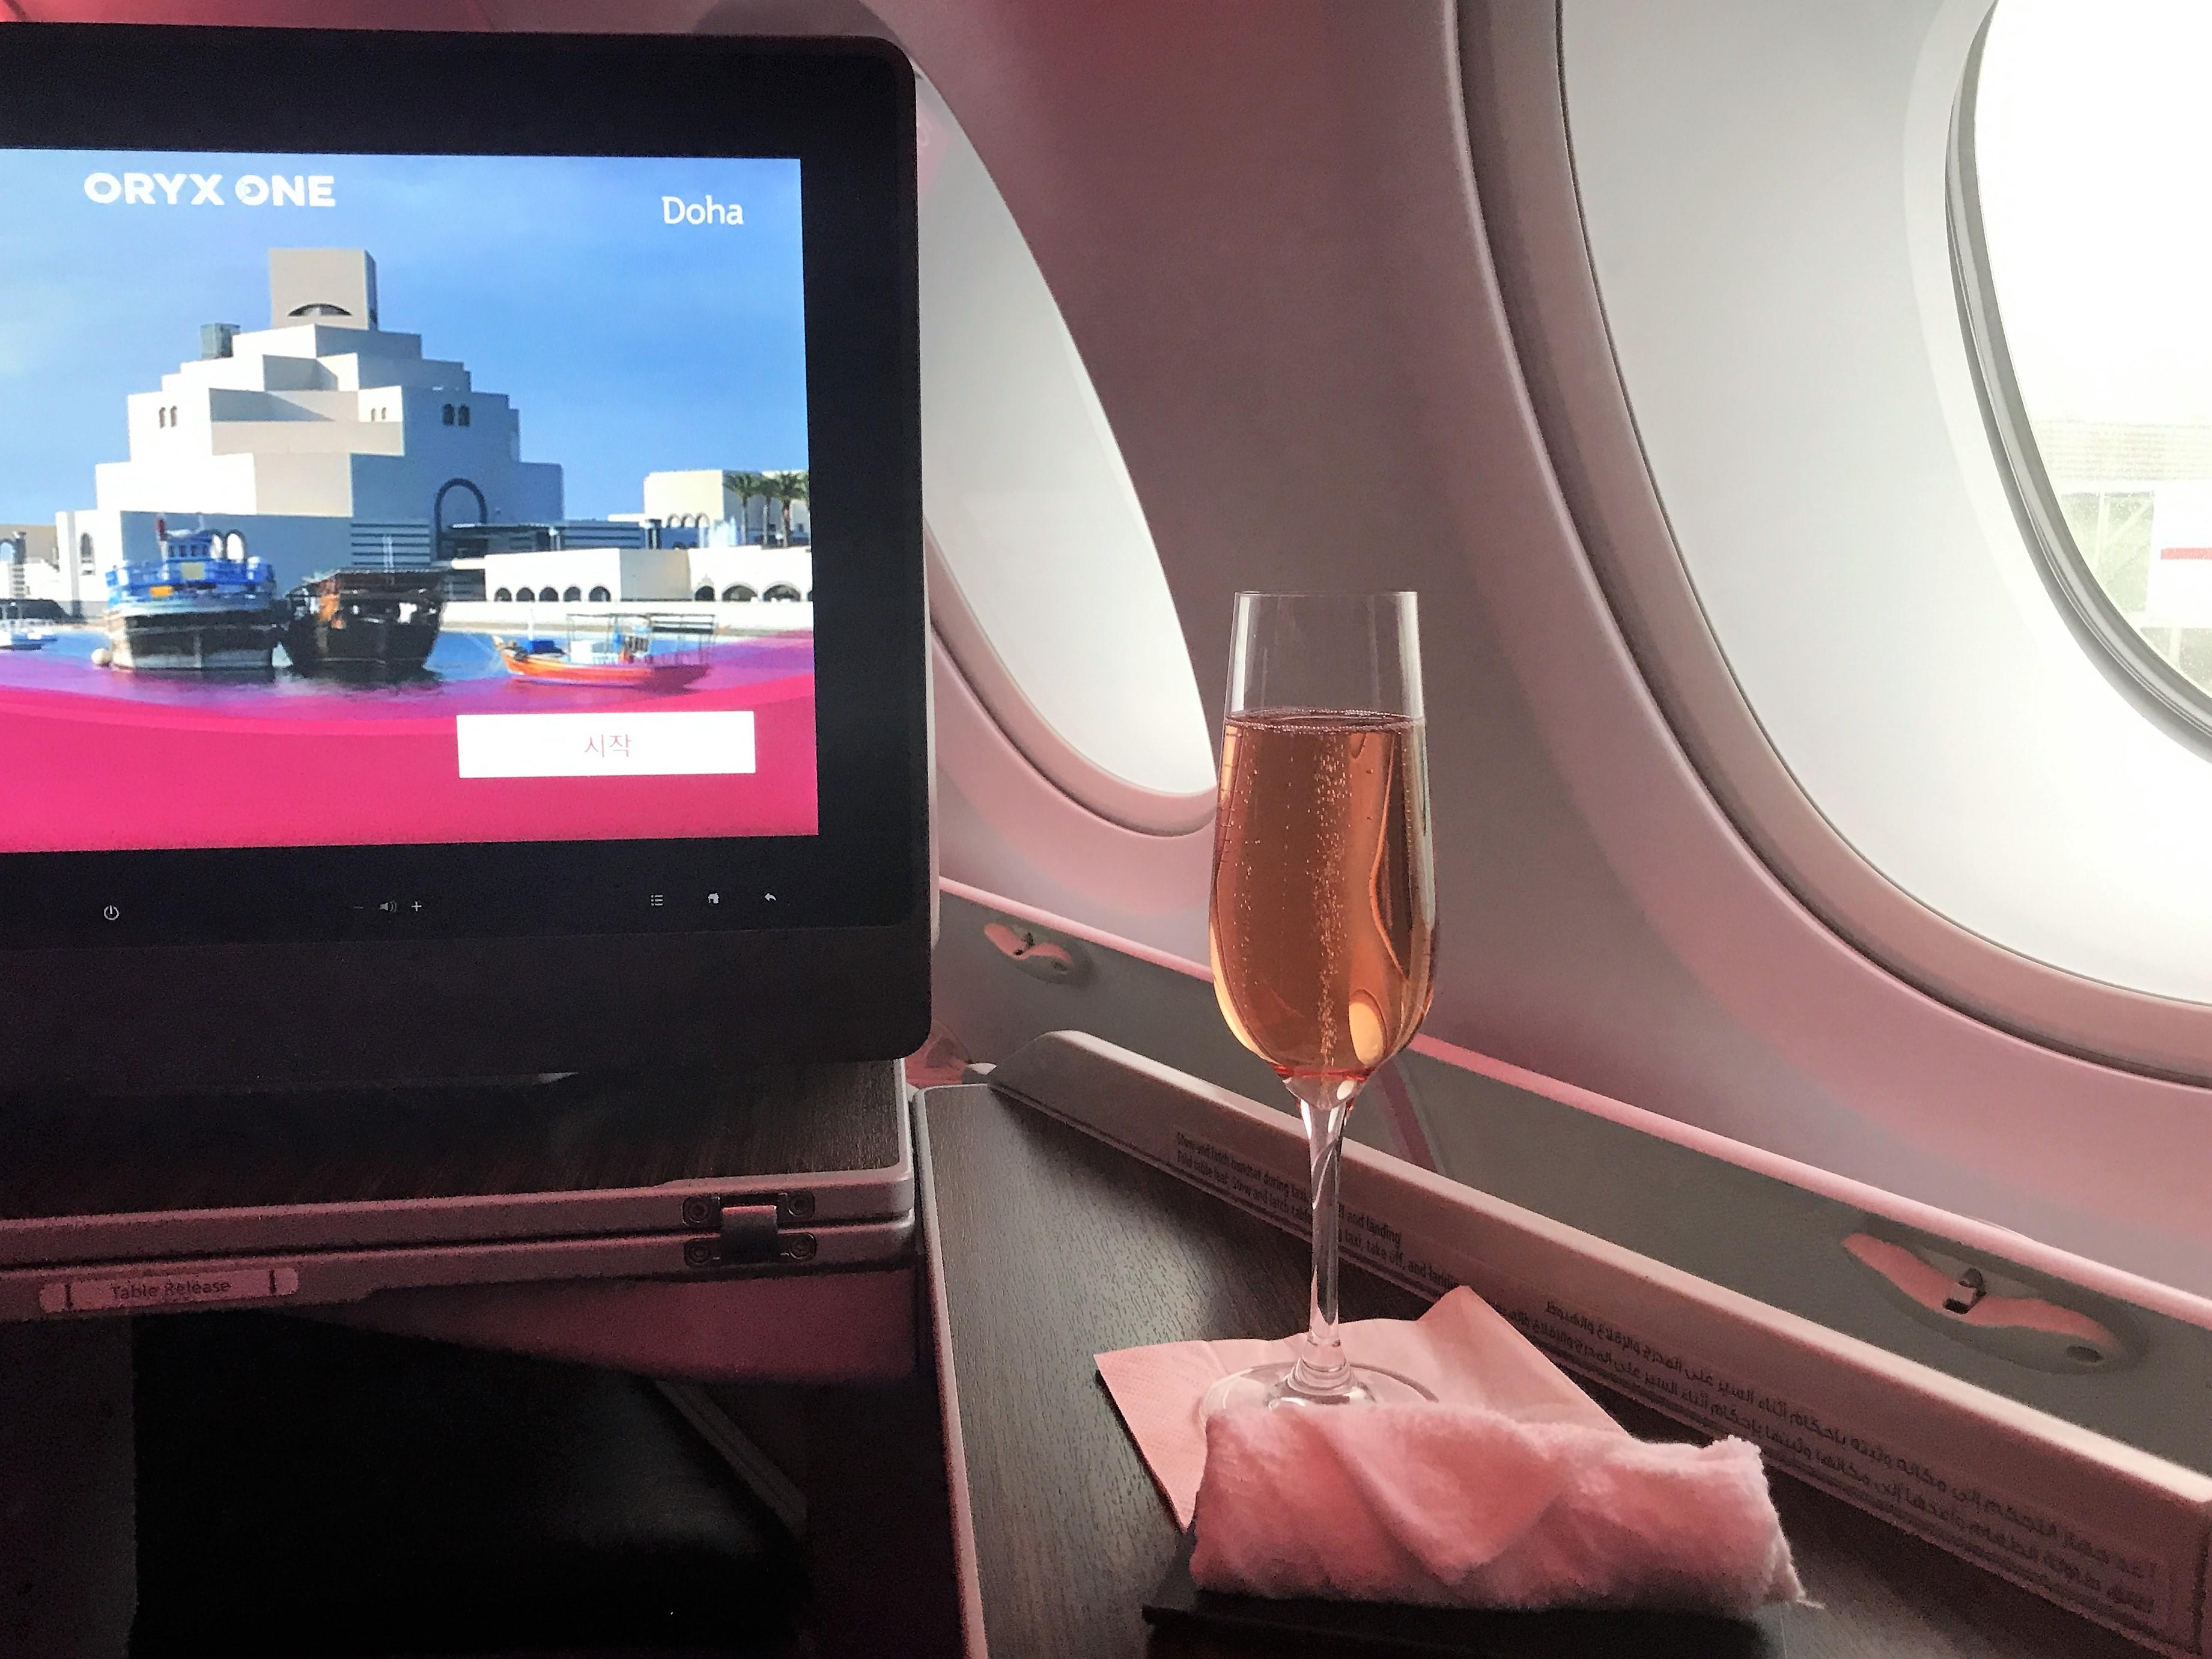 Qatar A380 business class review London